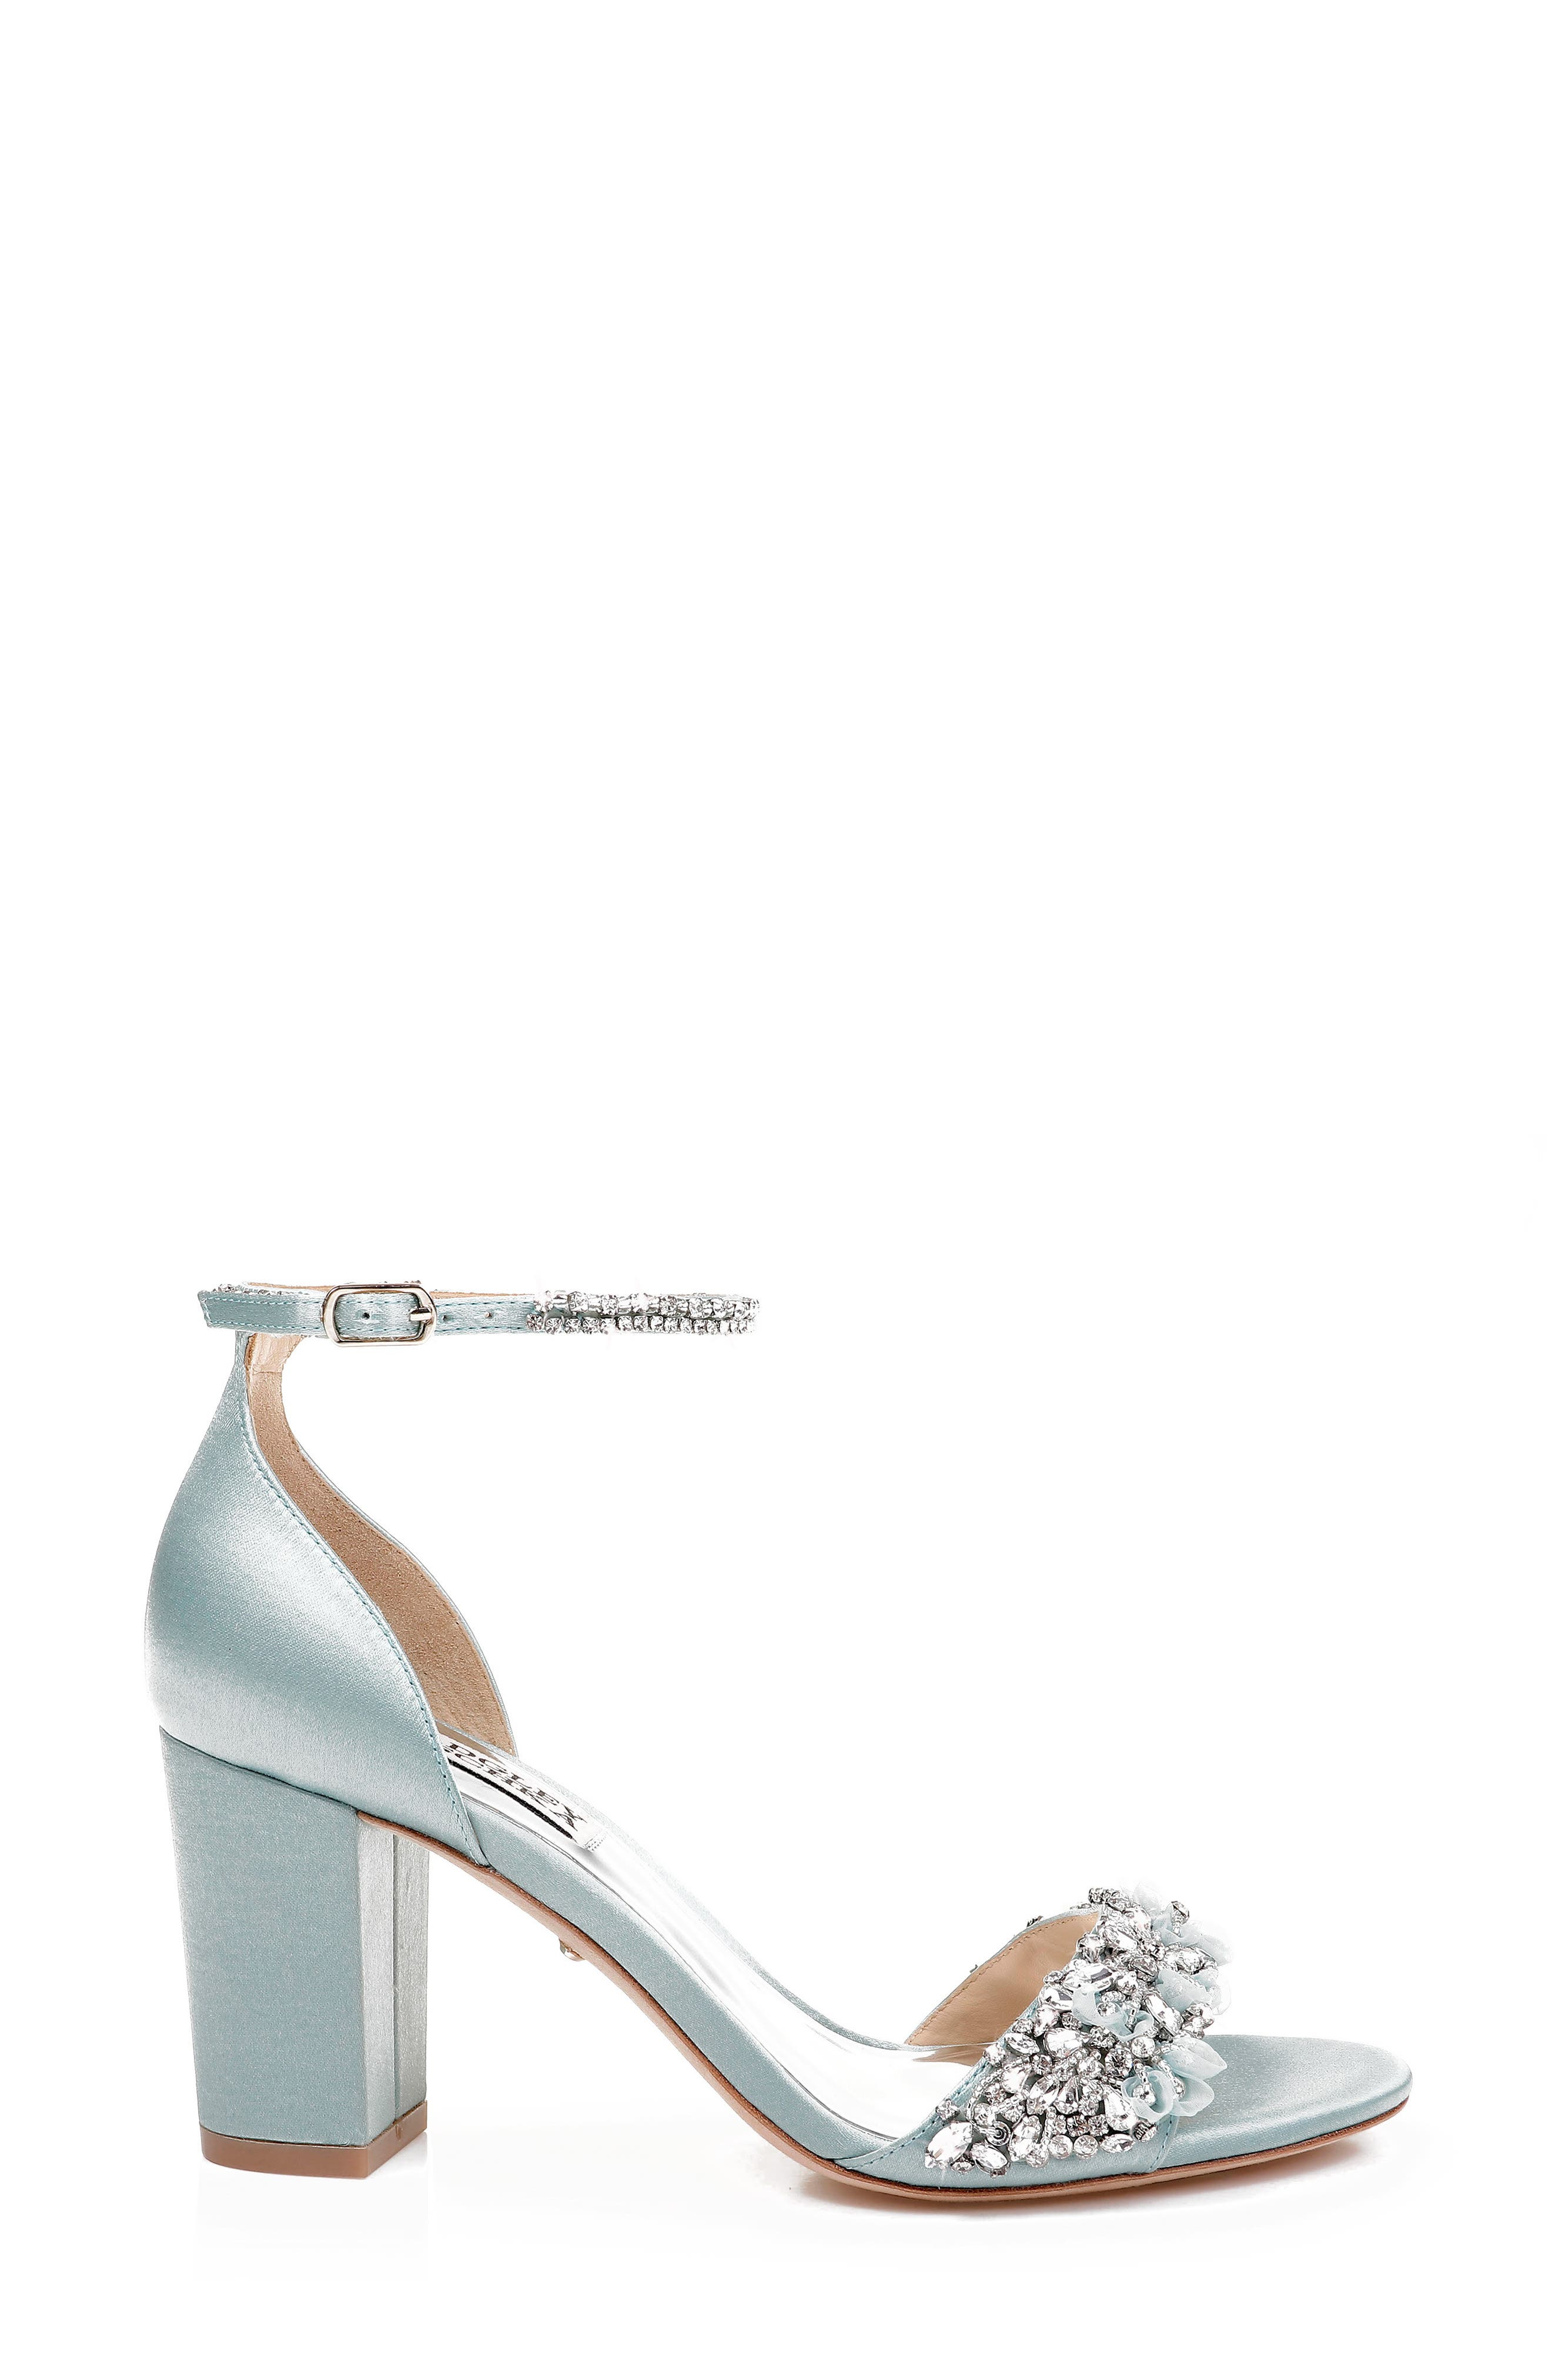 BADGLEY MISCHKA COLLECTION, Badgley Mischka Finesse Ankle Strap Sandal, Alternate thumbnail 2, color, BLUE RADIANCE SATIN